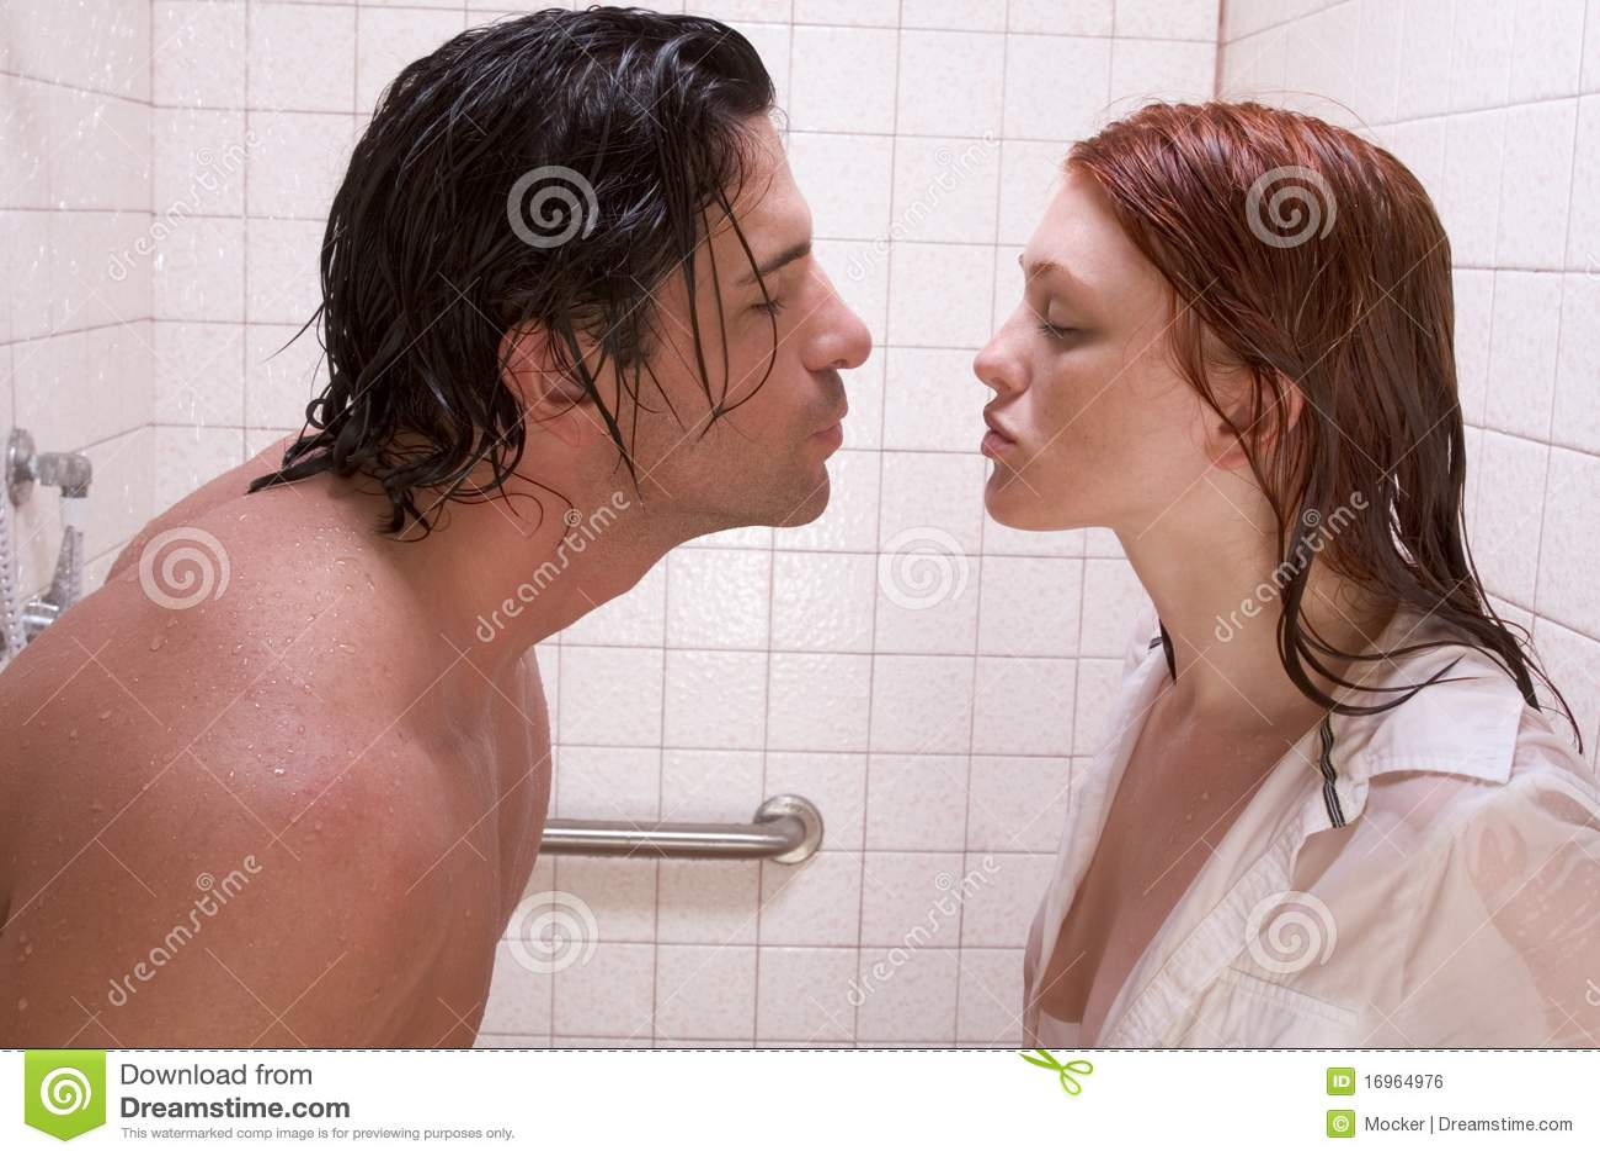 Nude shower dreamstime mocker